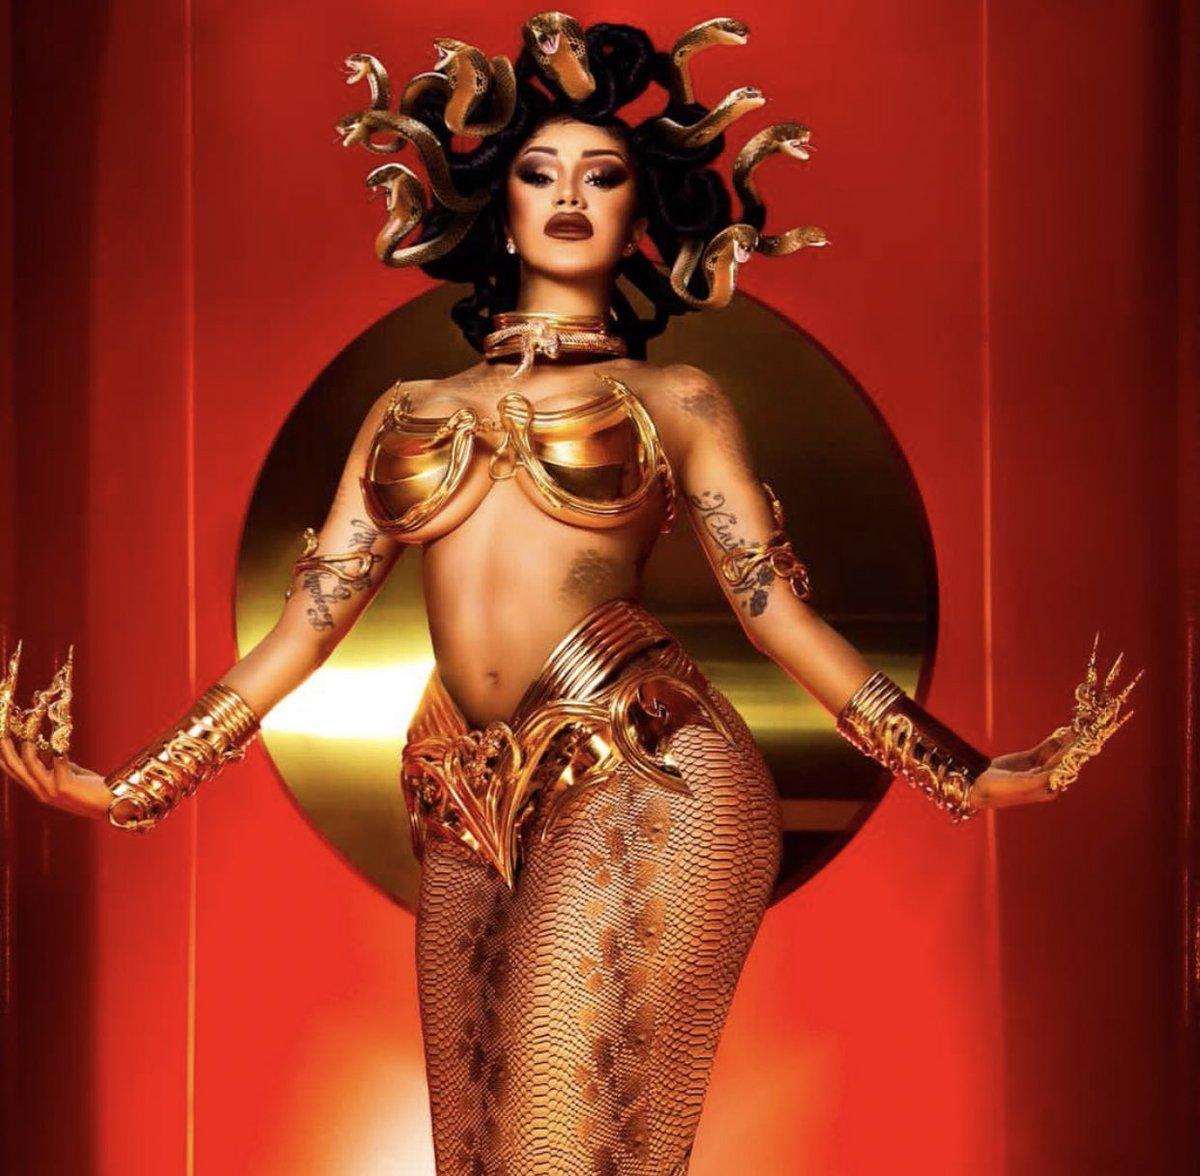 cardi-b-transformed-into-greek-goddess-medusa-to-celebrate-halloween